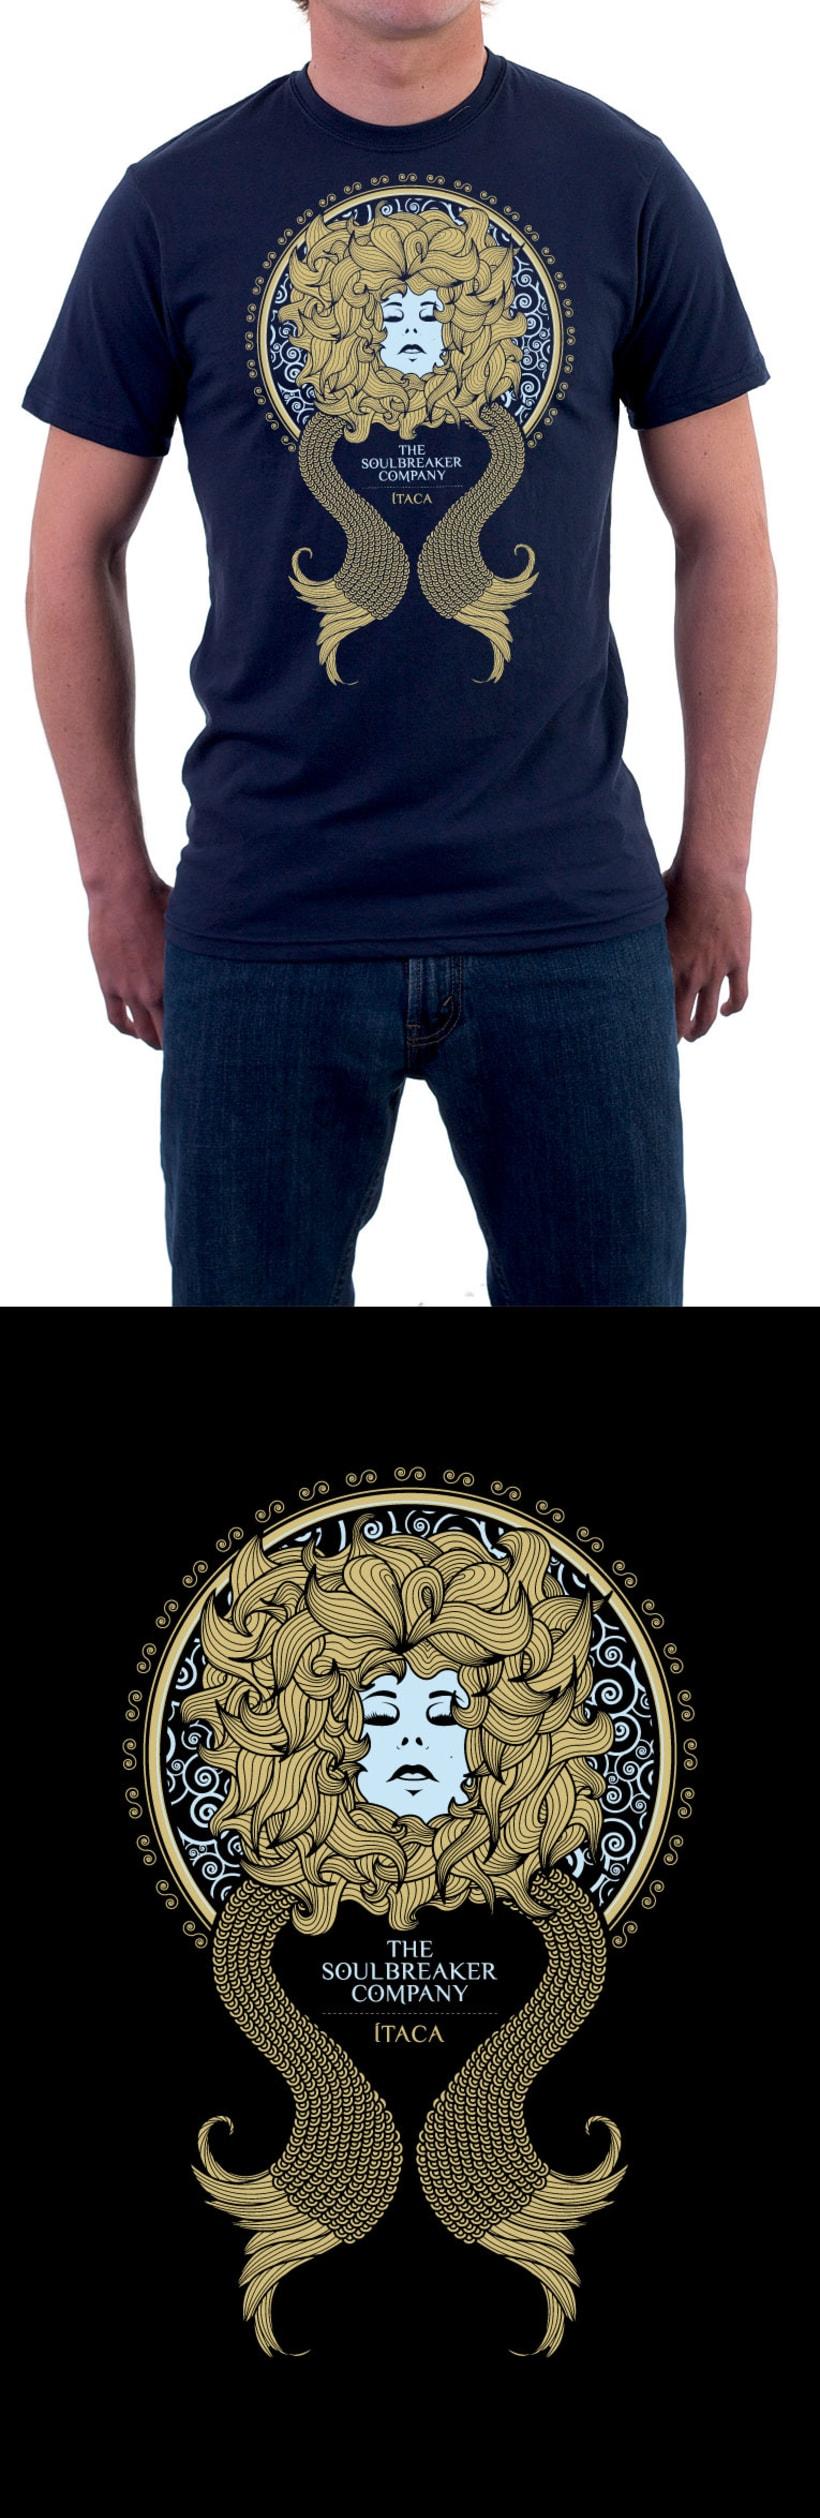 Camiseta The Soulbreaker Company 1